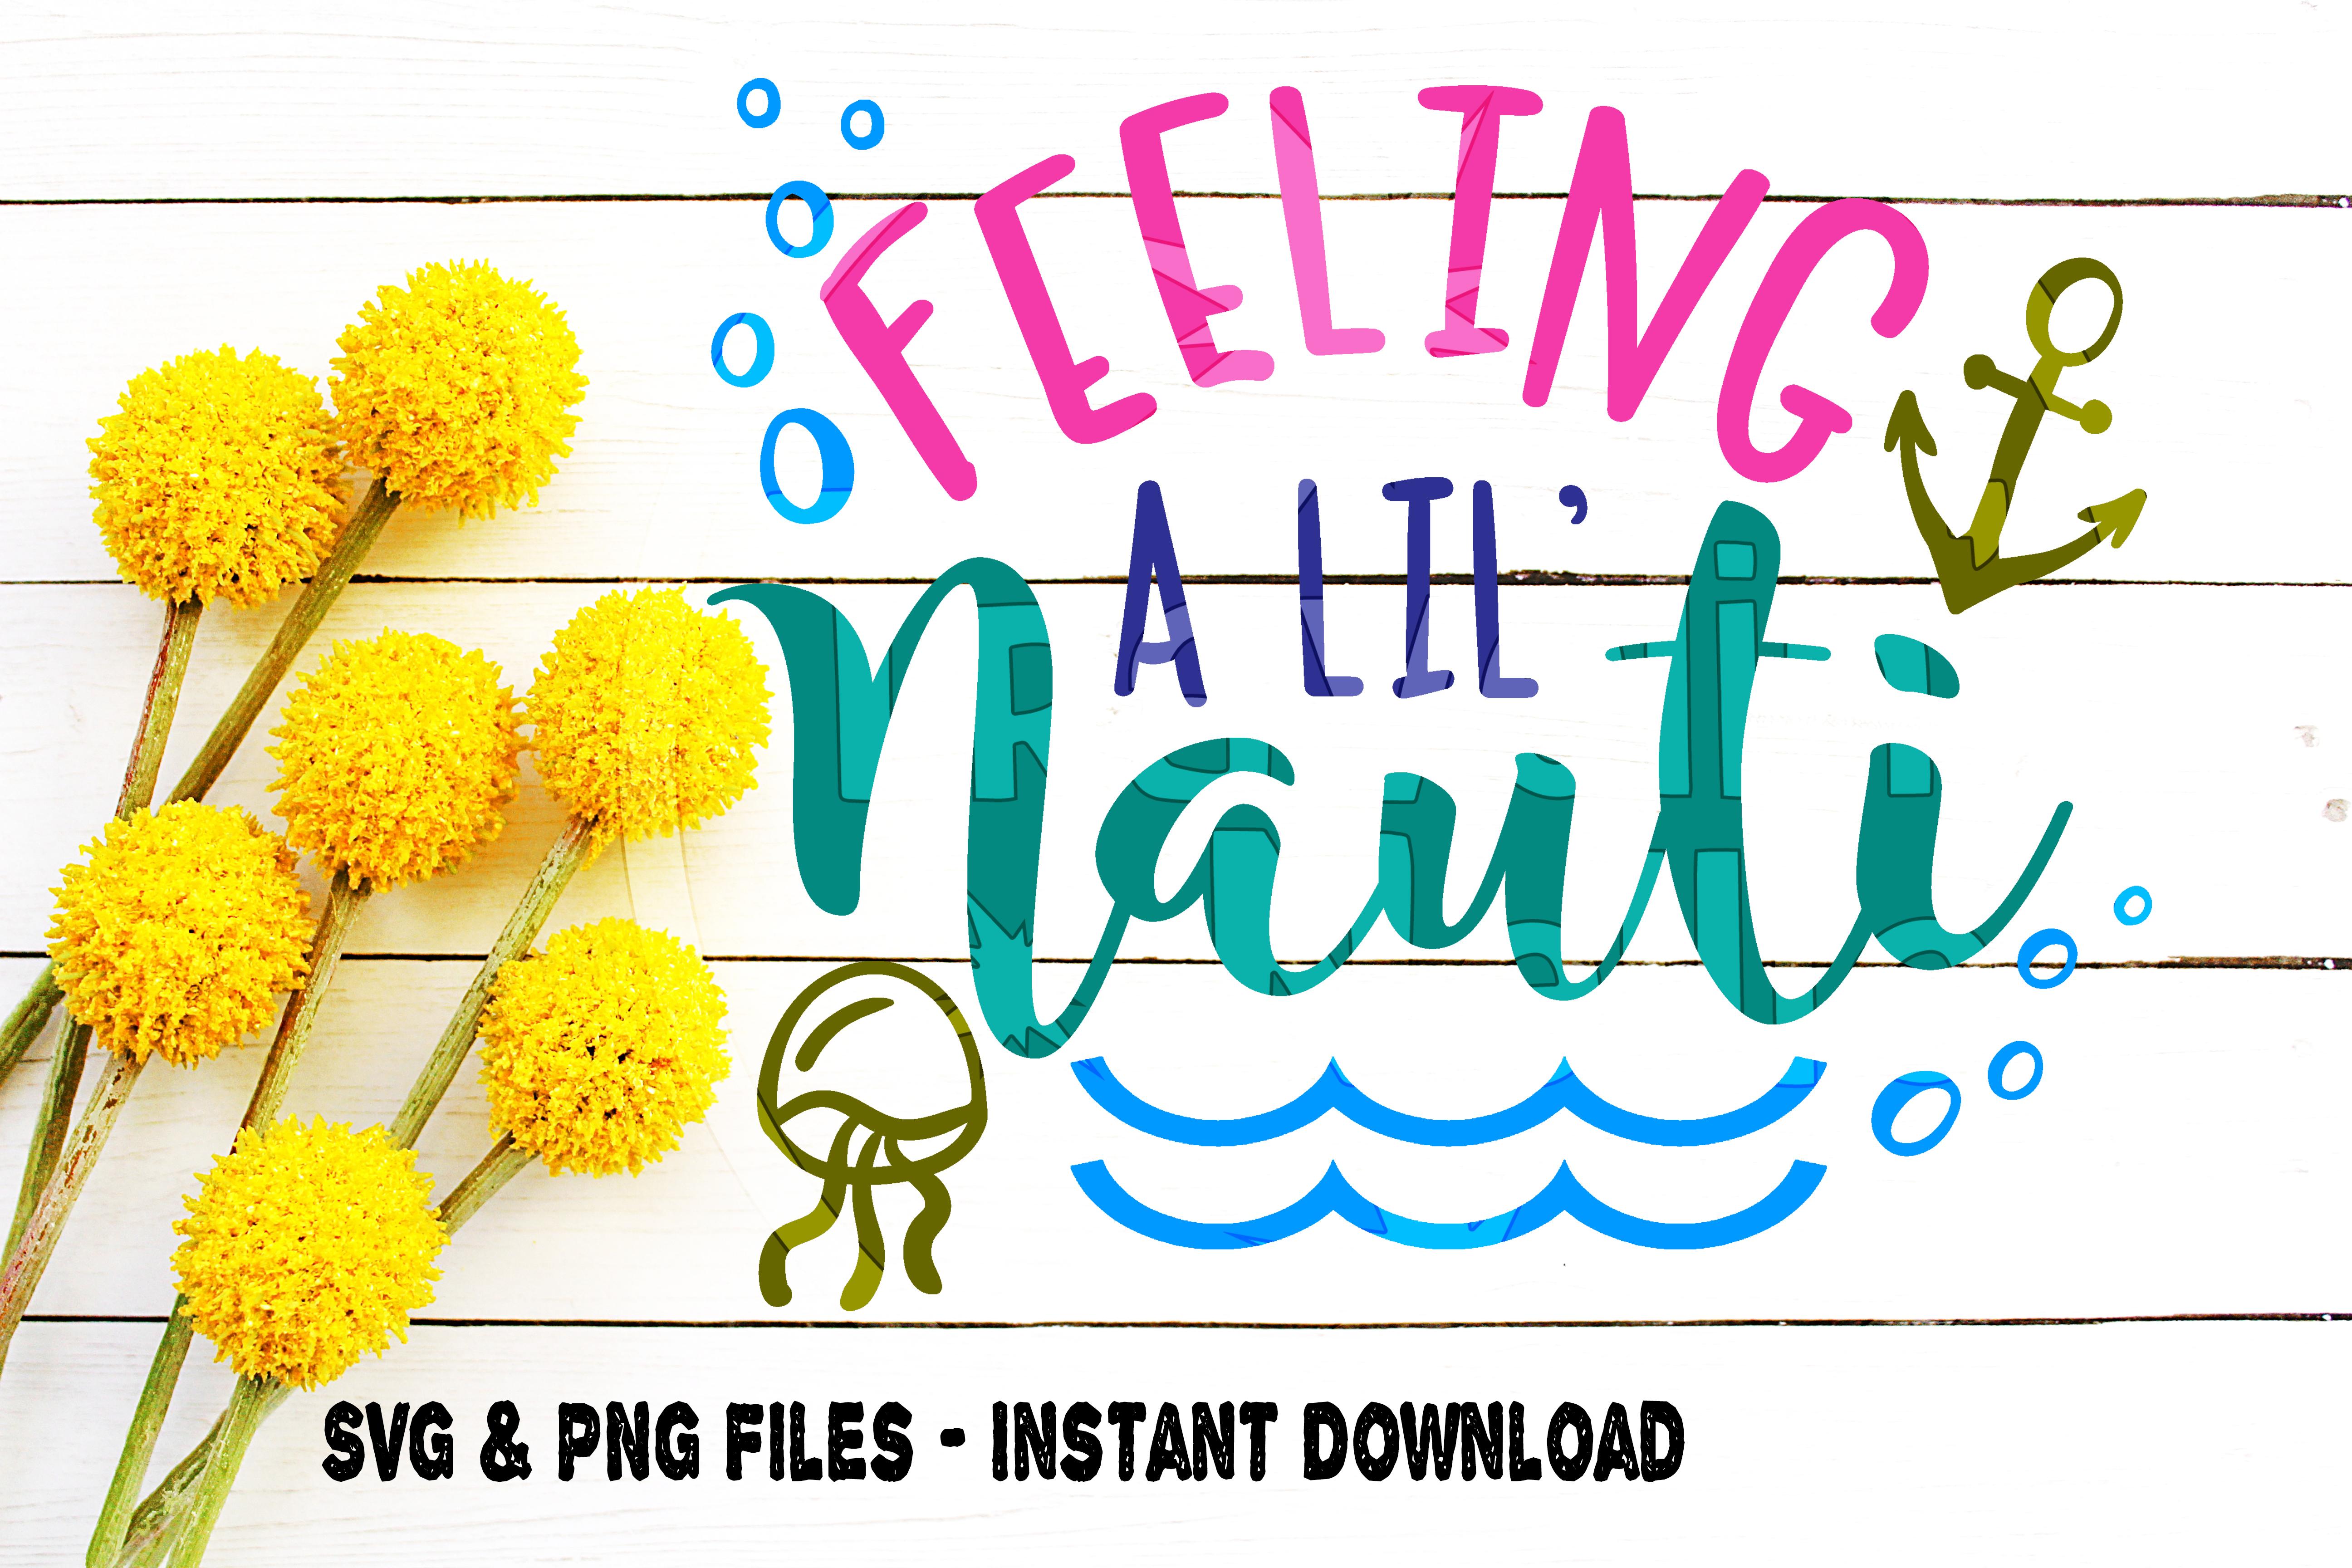 SVG Beach Bundle, 4, Beach Moods svg, Emotions svg, Feeling Nauti svg, Feeling Beachy svg, Feeling Jelly svg, Feeling Salty svg, Cut File example image 4